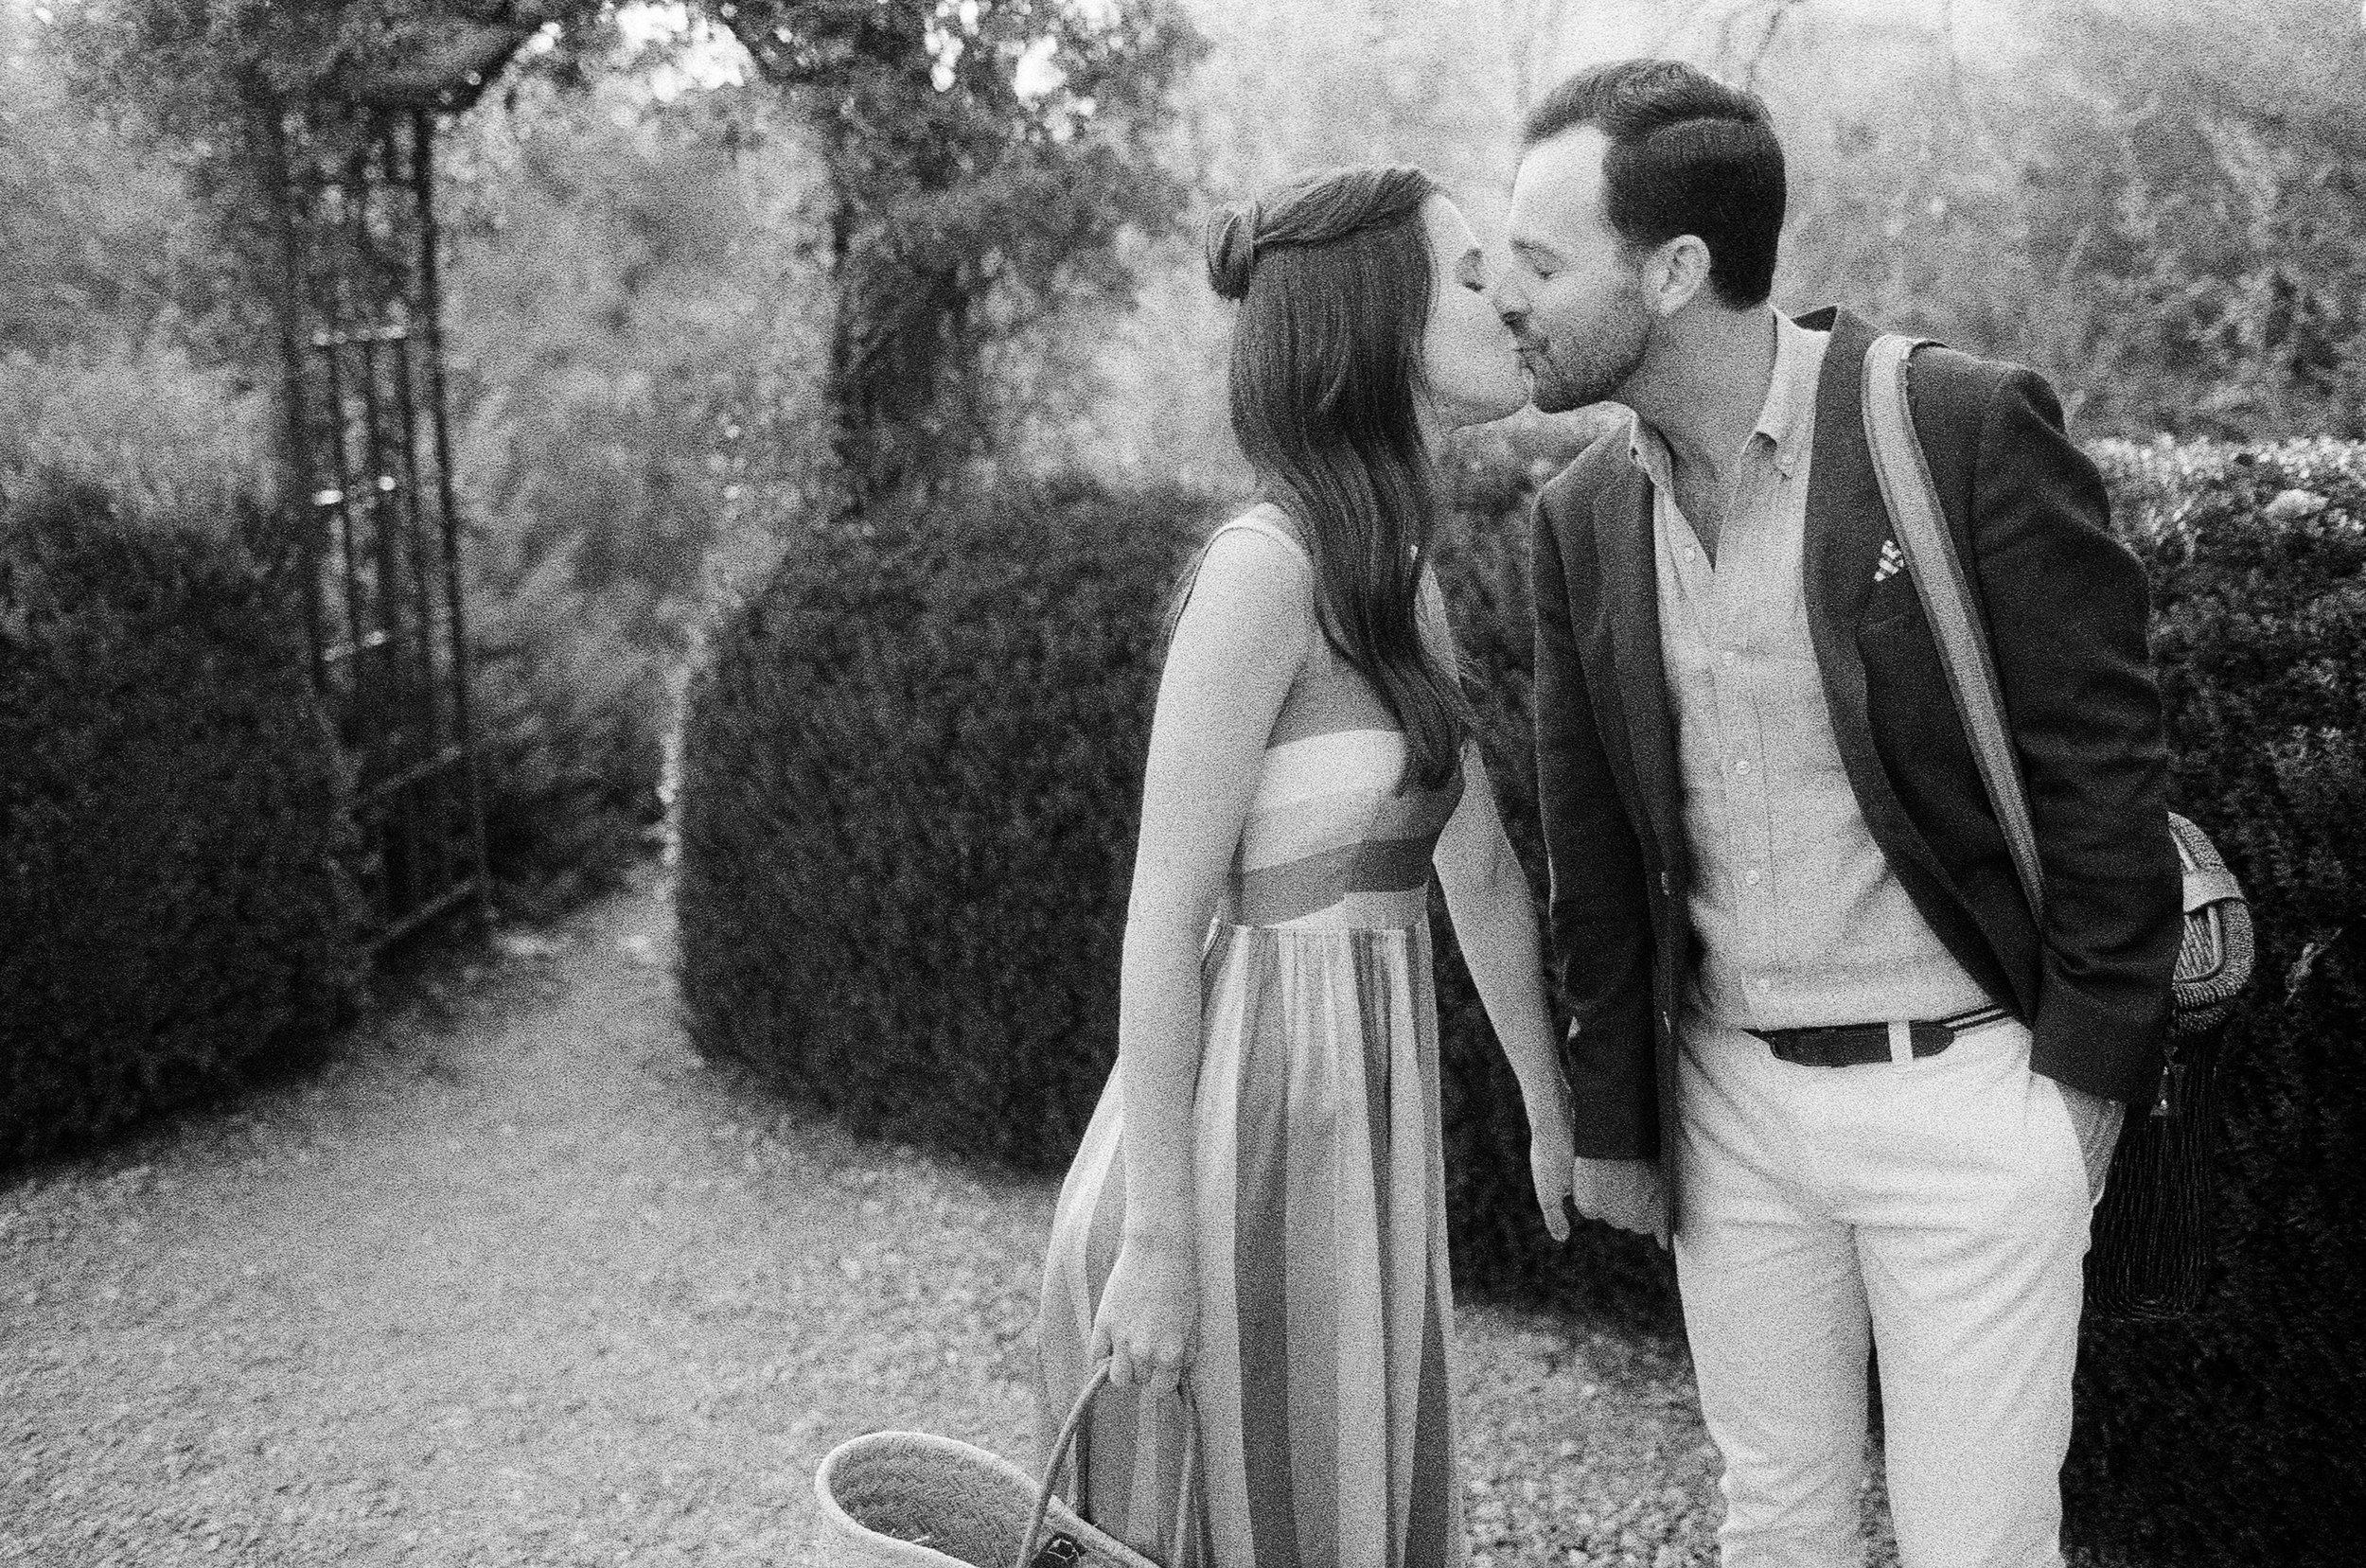 Katie-Mike-Engagement-103-Jen_Huang-000007180032.jpg